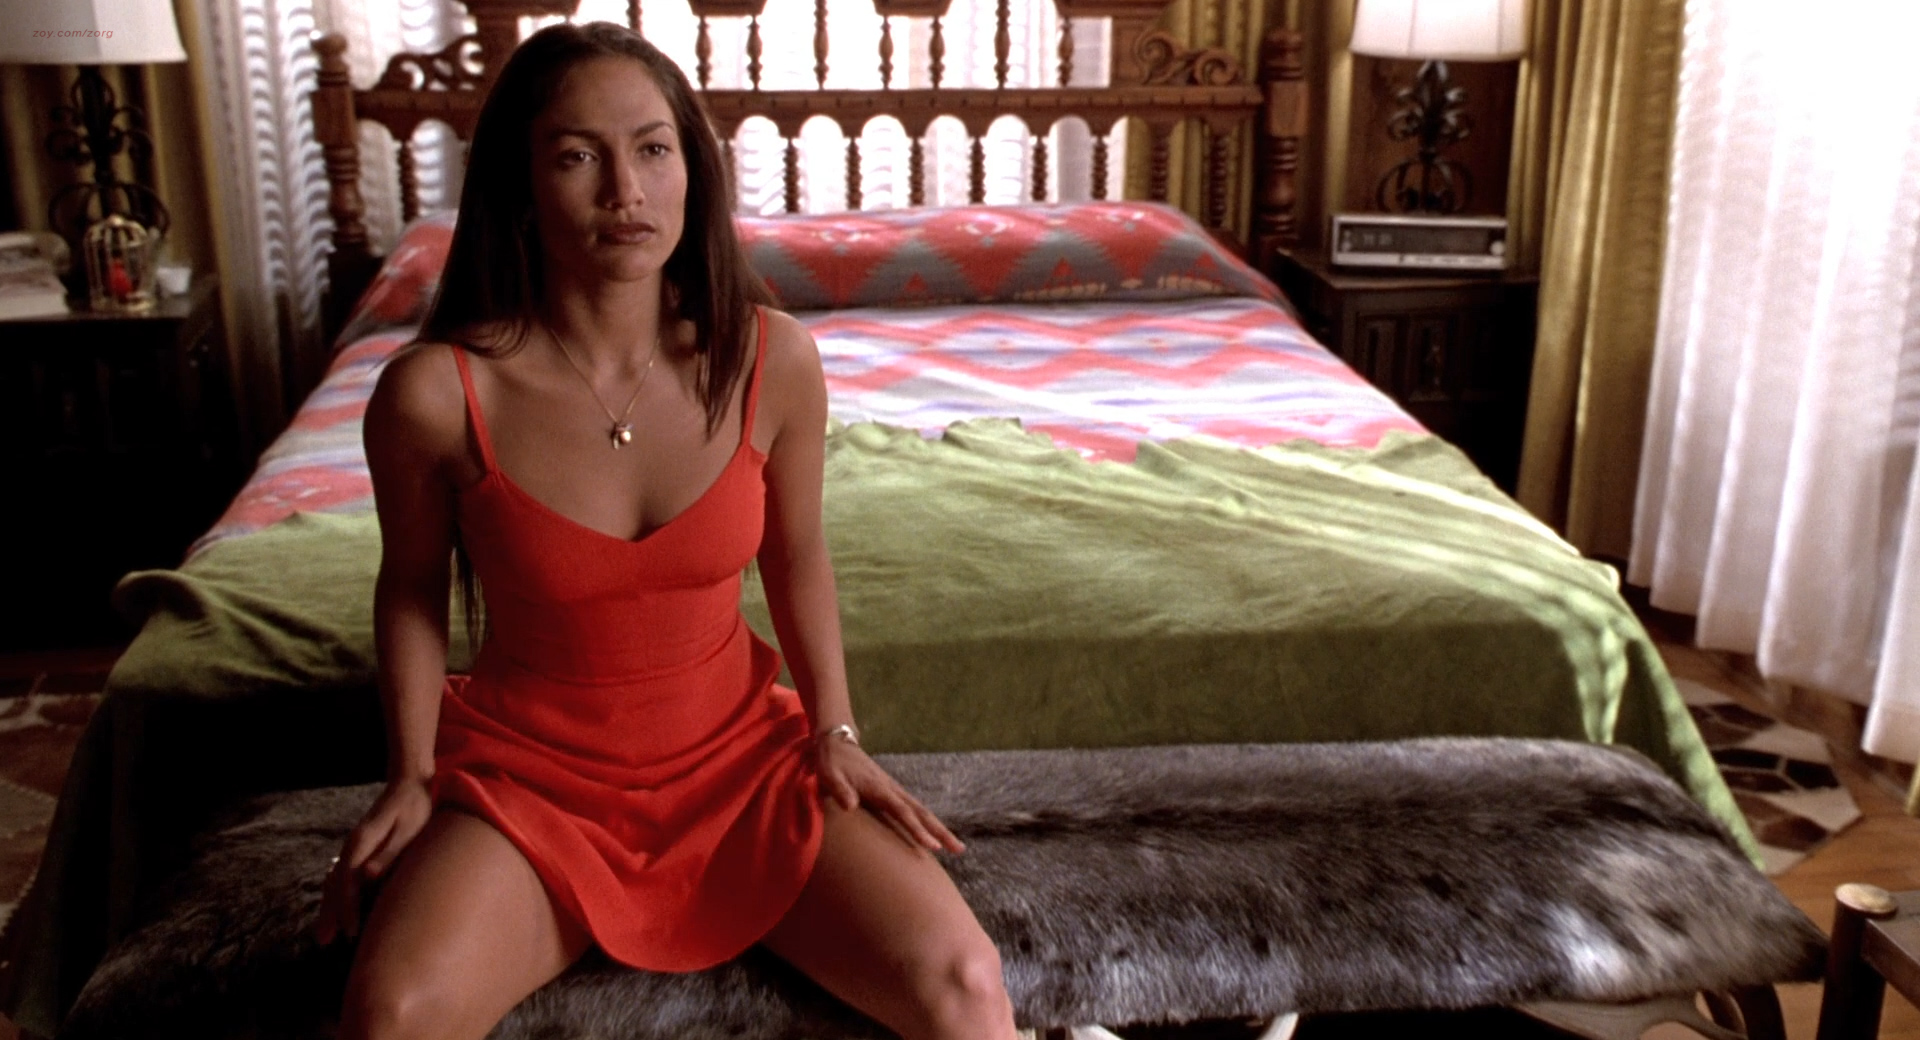 Jennifer lopez nude sex scene on scandalplanetcom 3